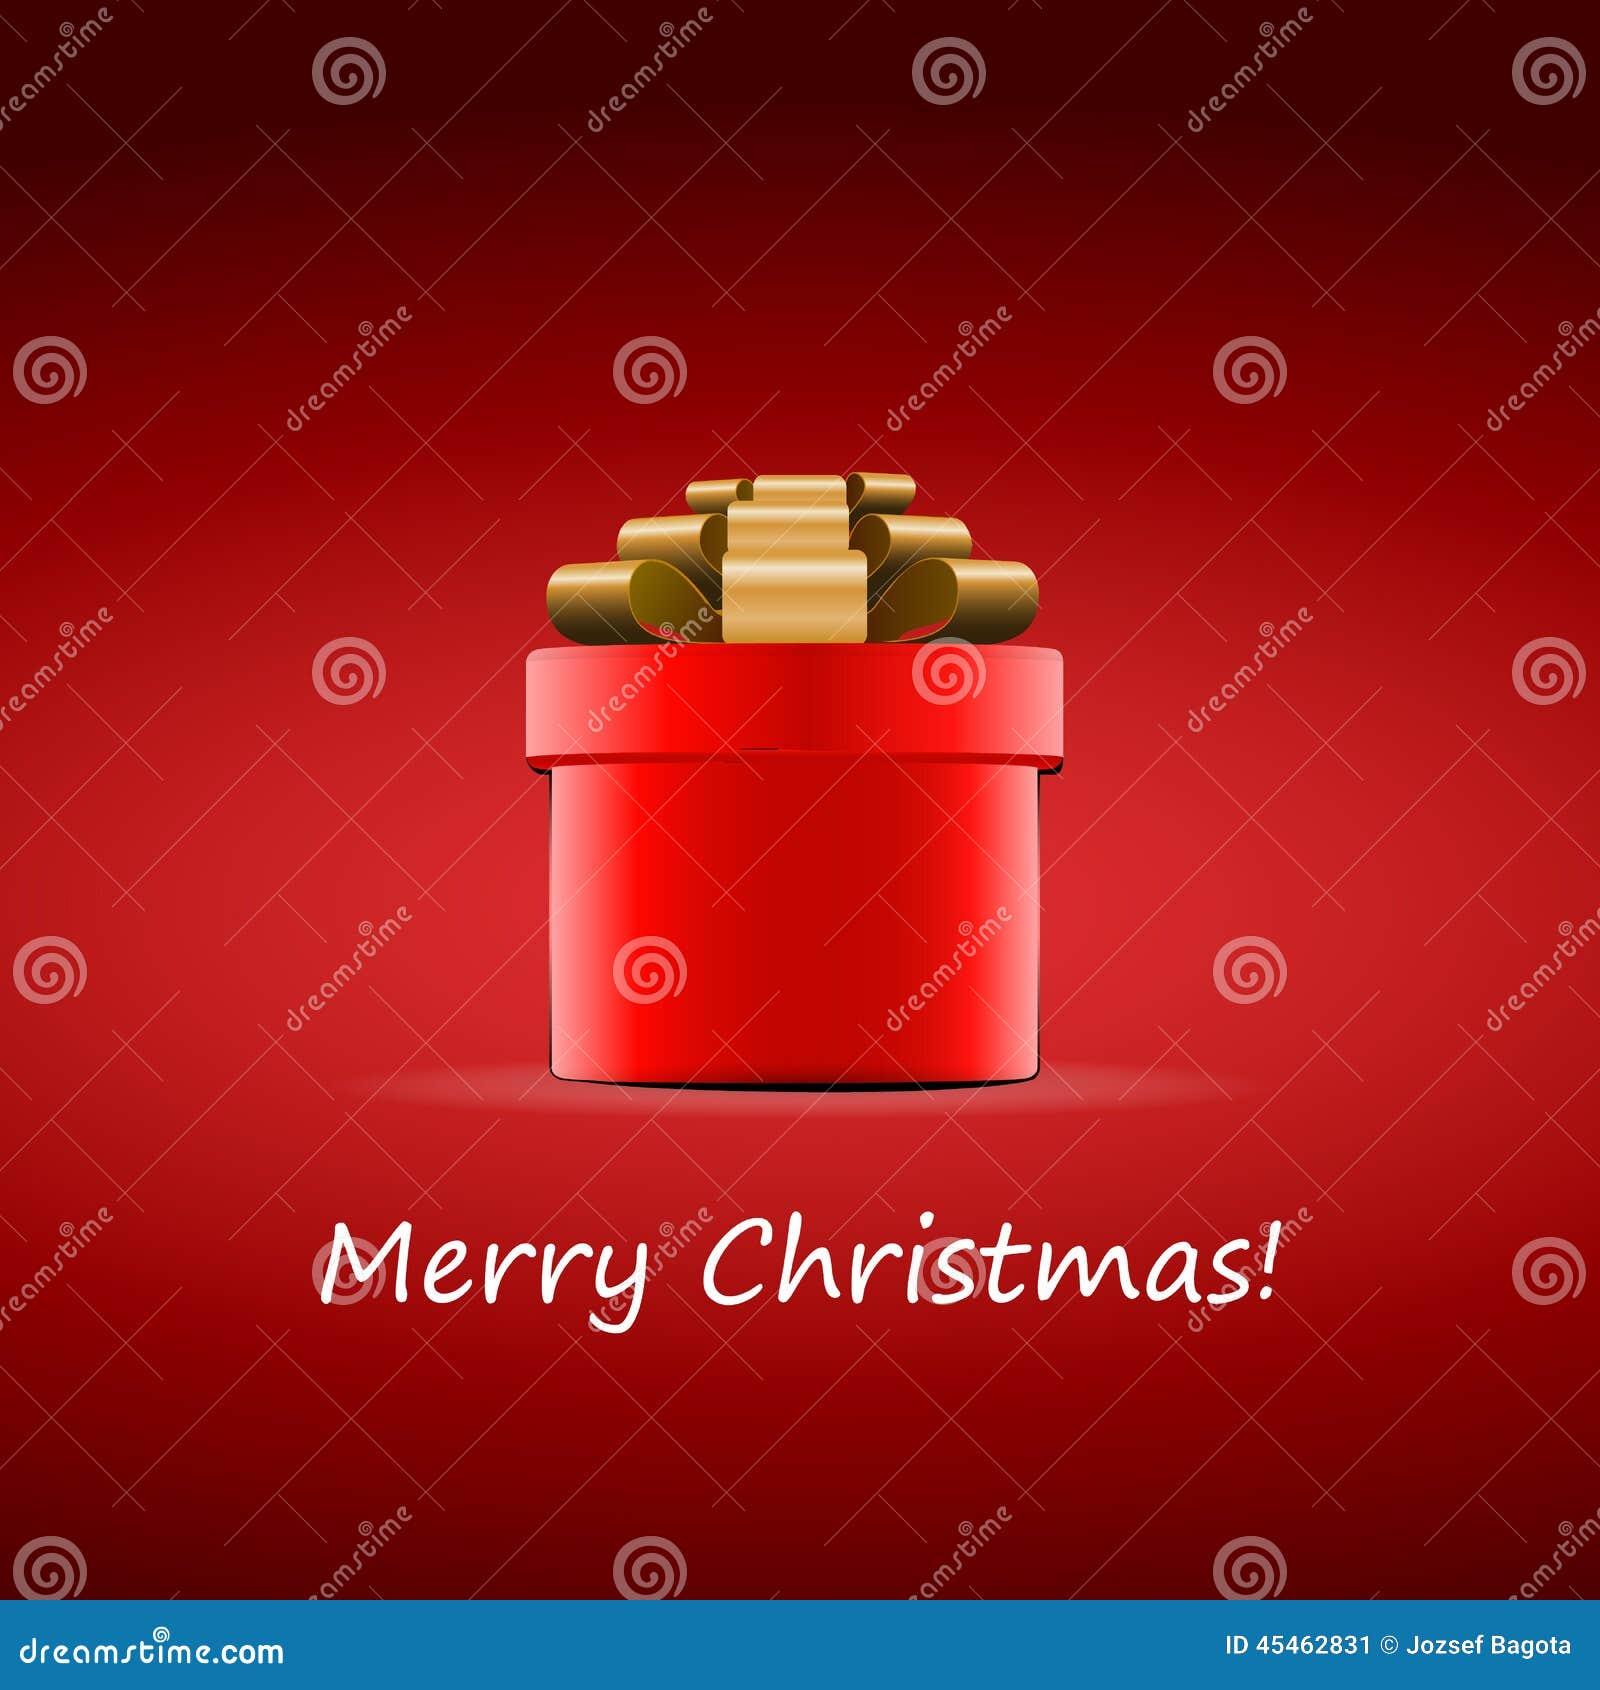 merry christmas - red gift box design for christmas stock image